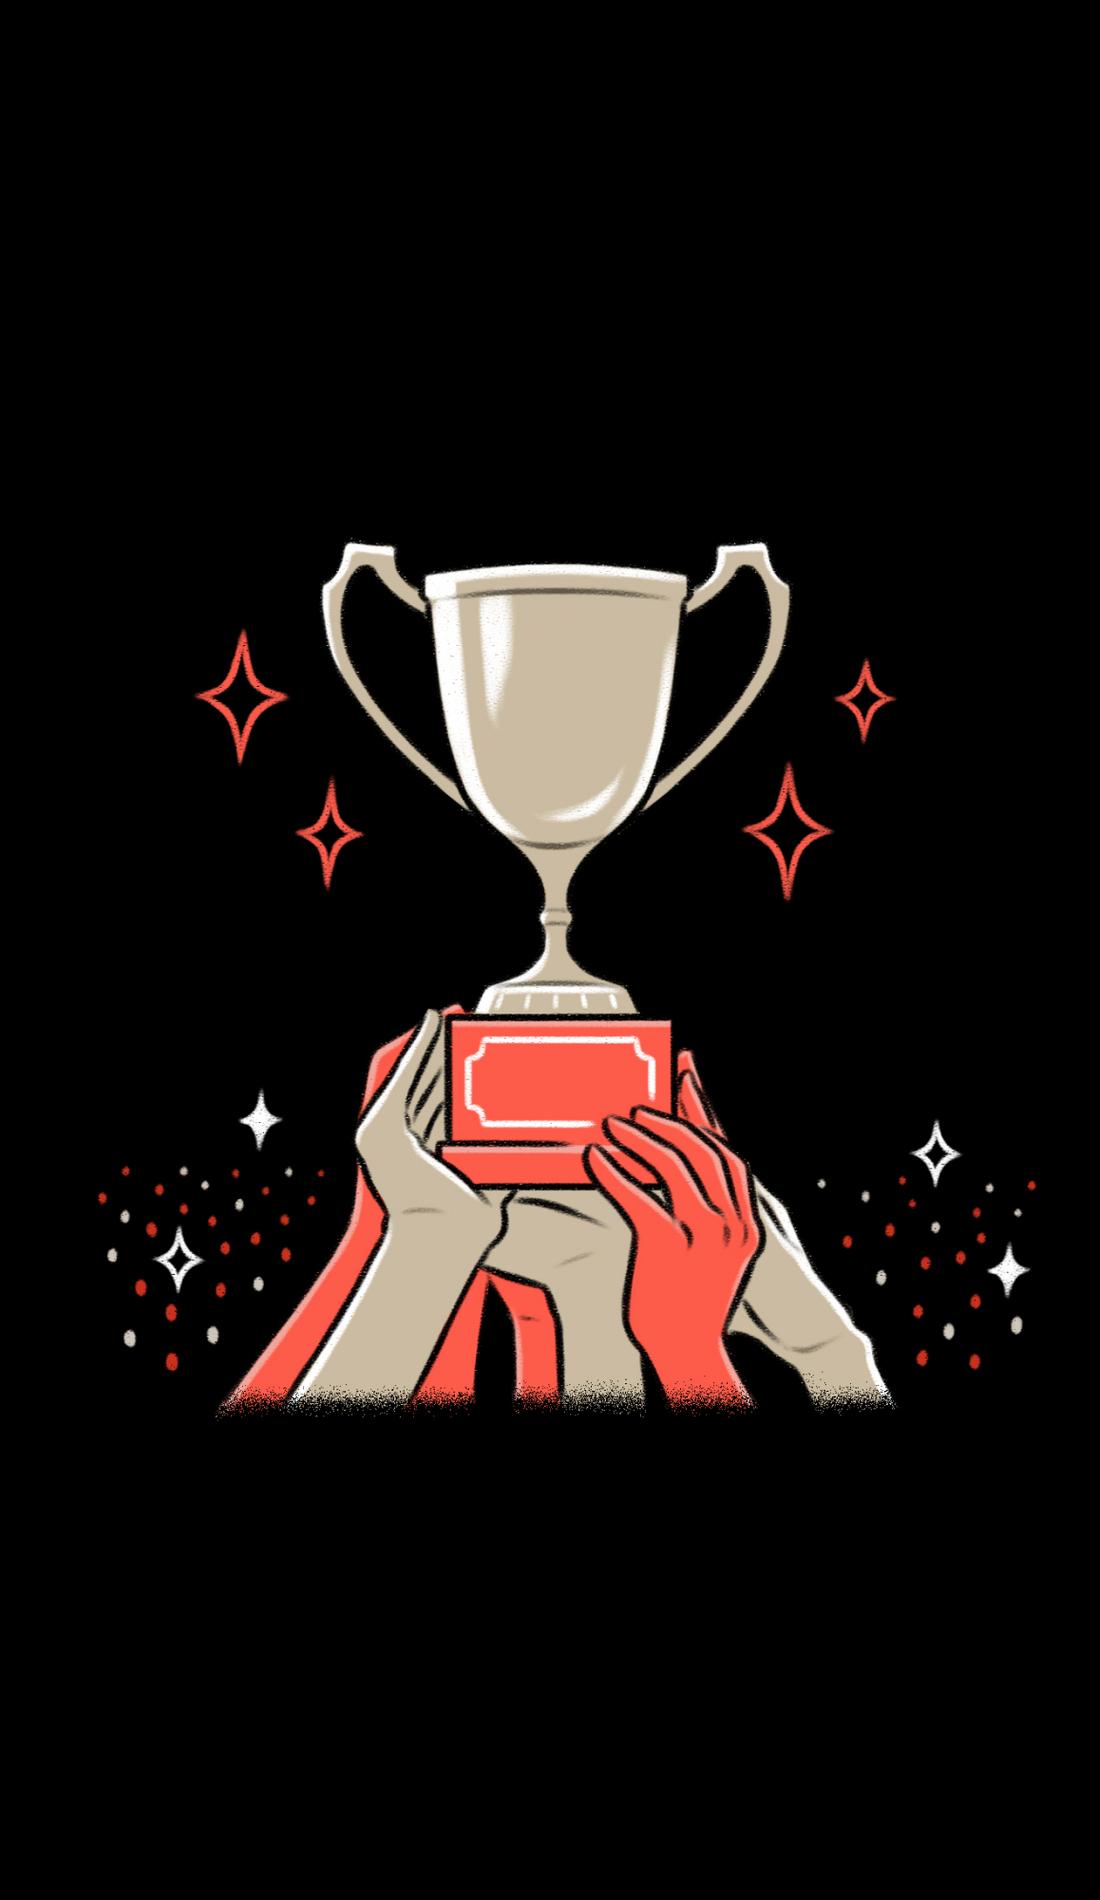 A Auburn Tigers Softball live event